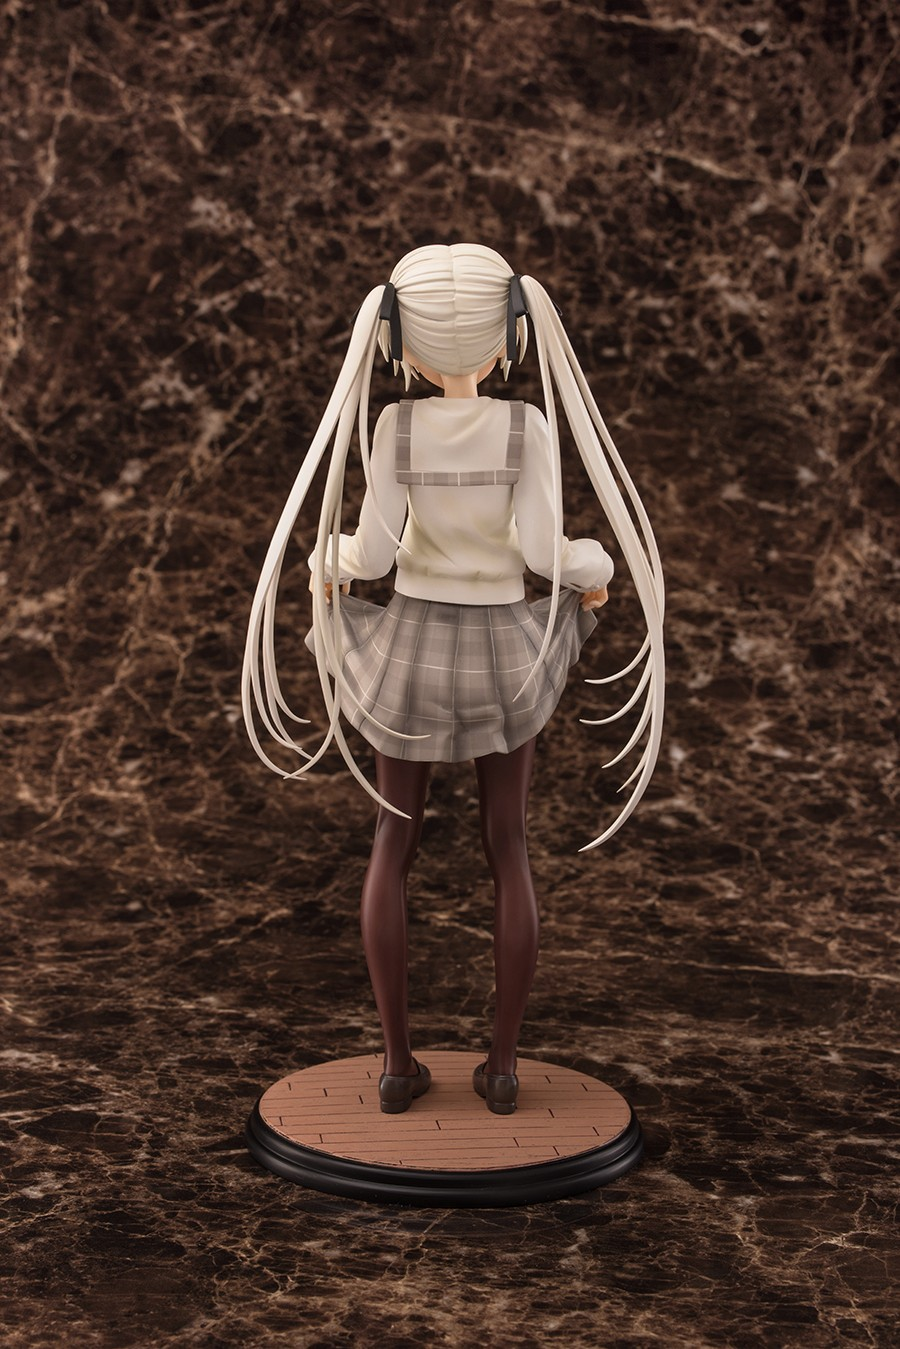 25CM 1/6 Scale Game In Solitude Kasugano Sora School Uniform Ver Model PVC Sexy Adult Collection Gift Doll Anime Action Figure ложка сервировочная laracook цвет зеленый длина 32 см